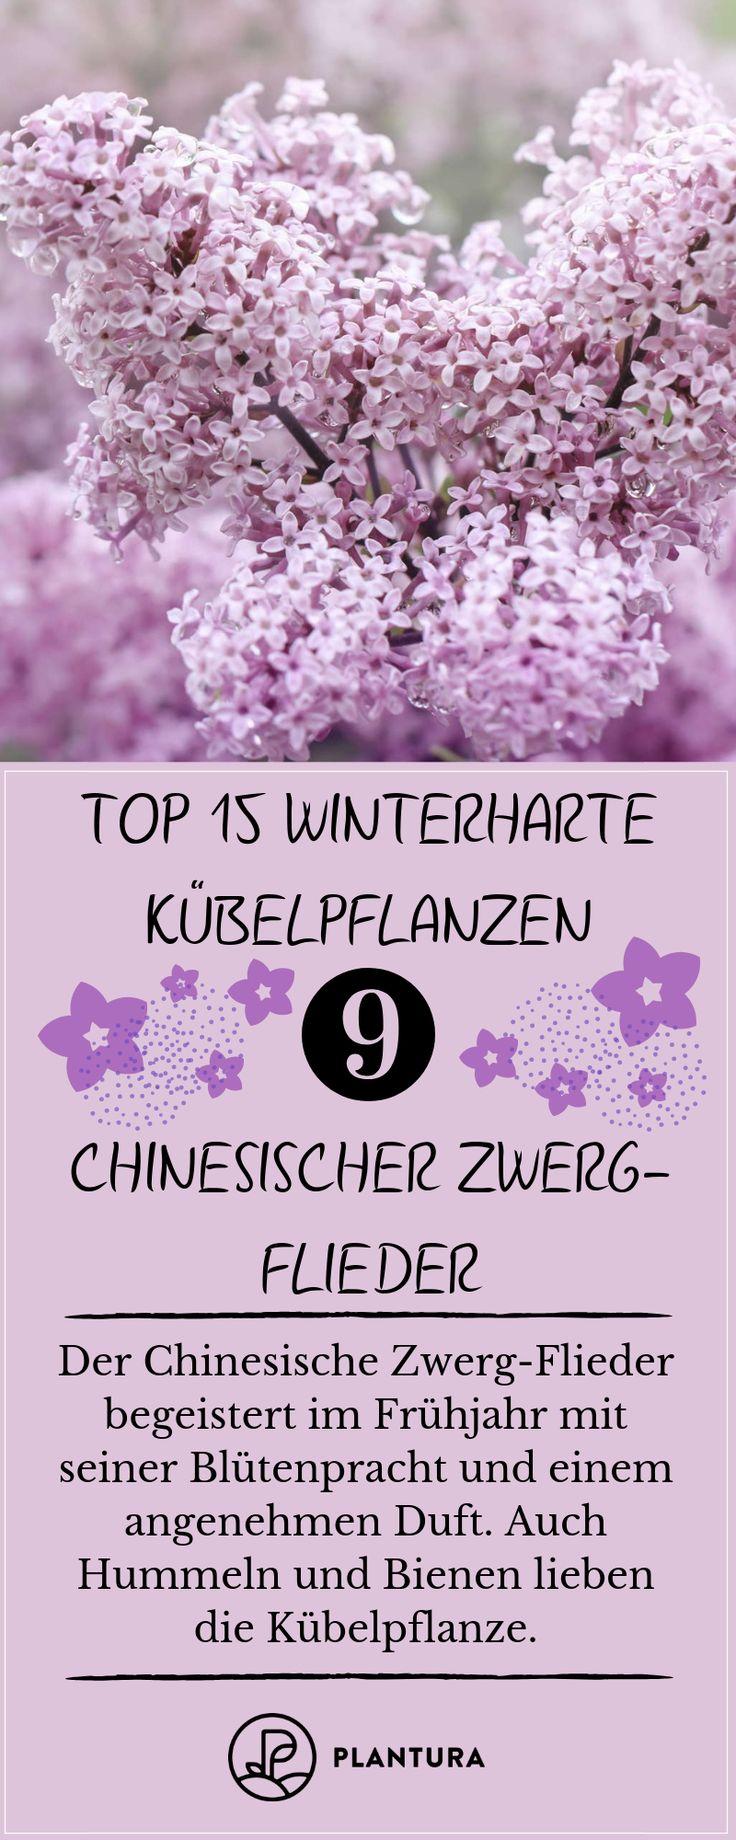 Winterharte Kübelpflanzen: Unsere Top 15